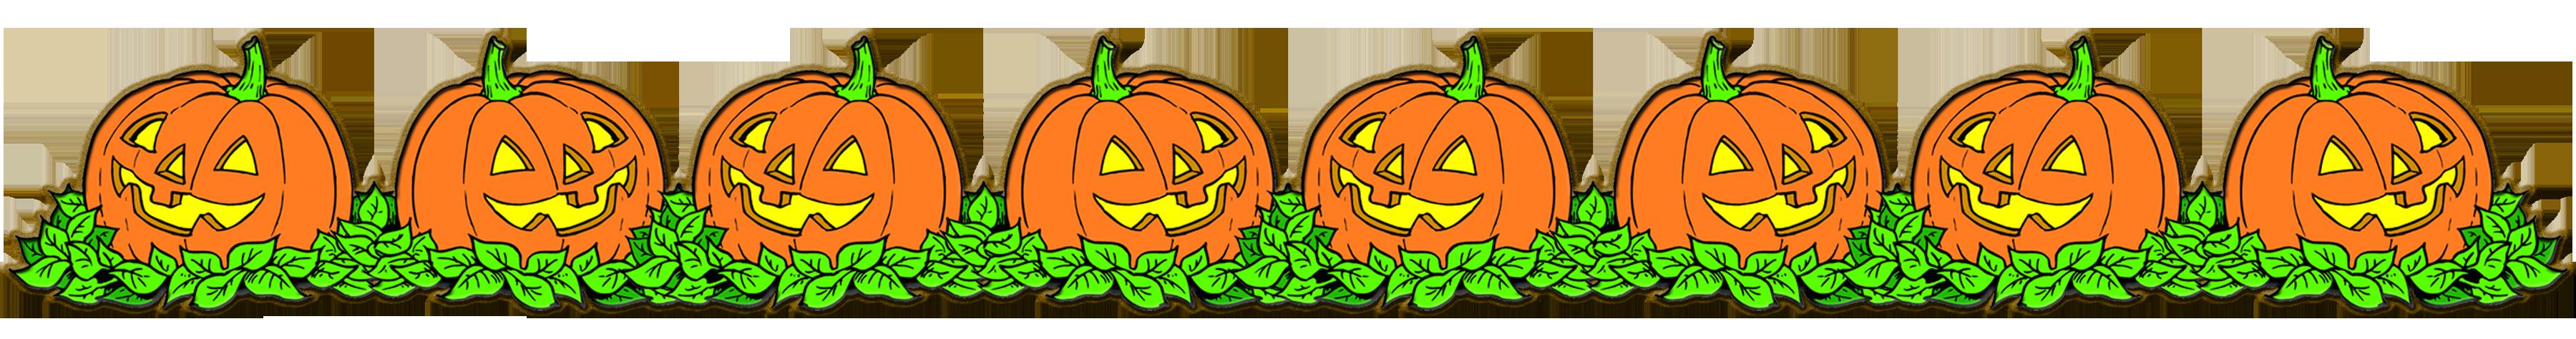 Free pumpkin borders.